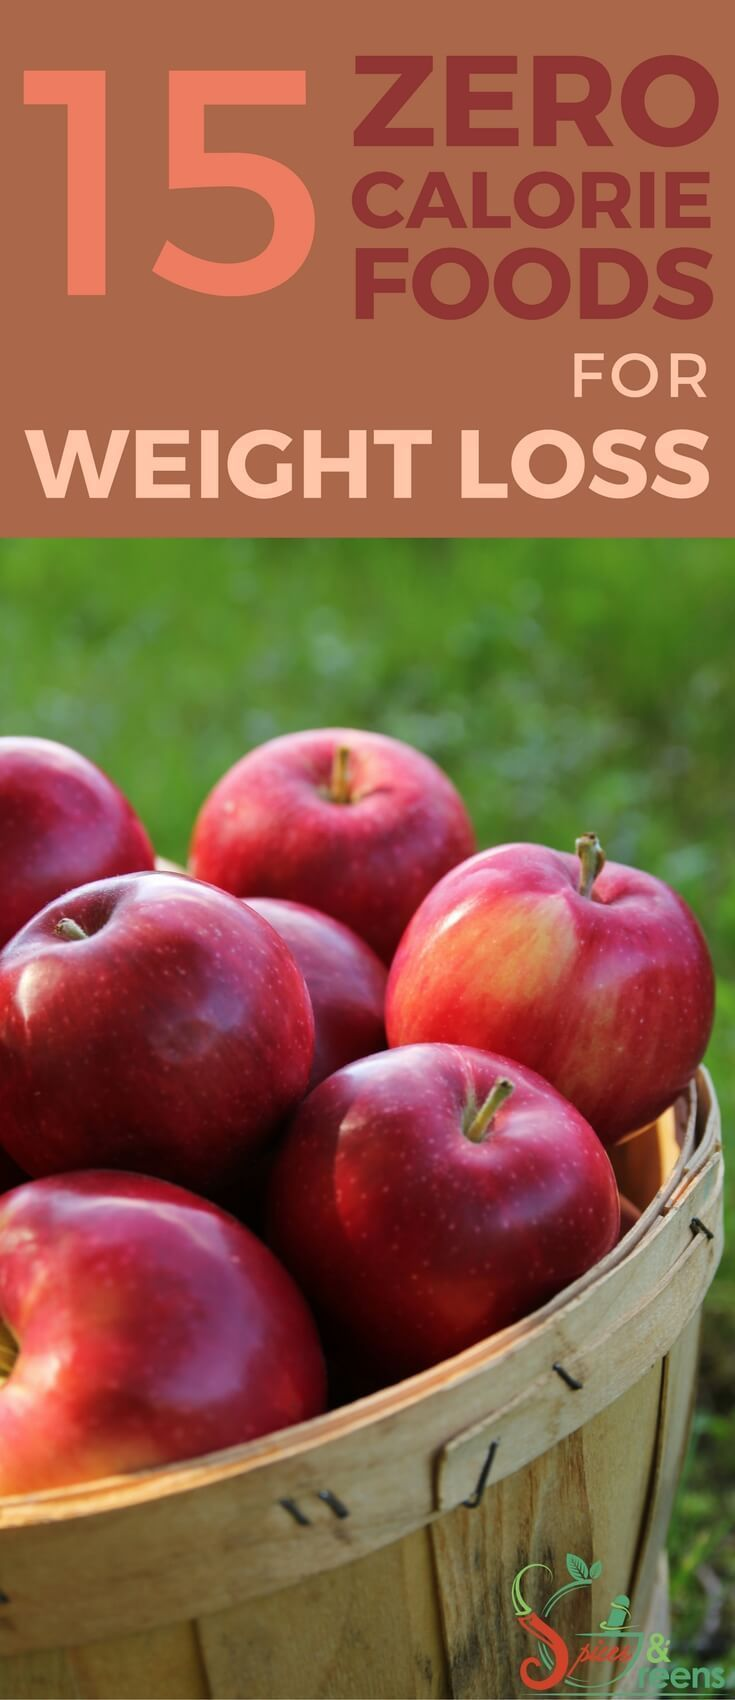 Developing a weight loss program